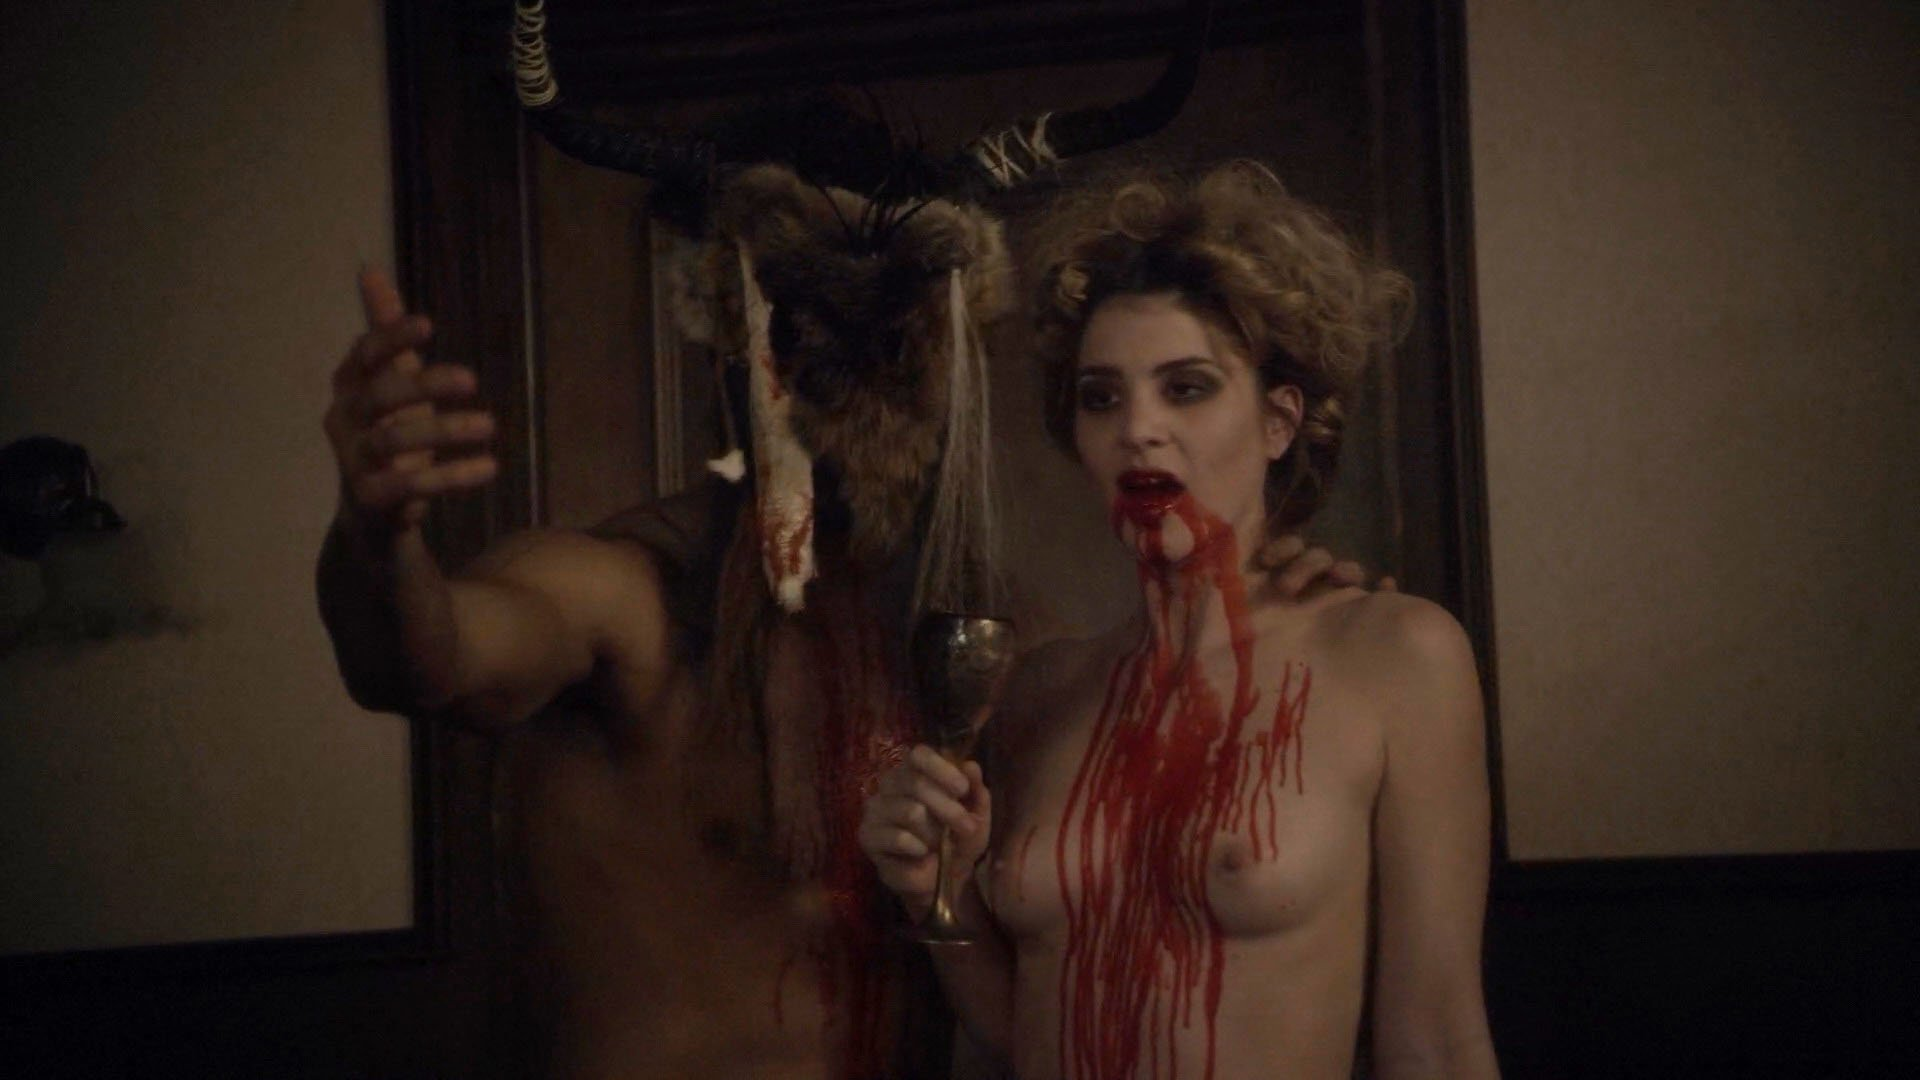 Erin Johnson nude - The Institute (2017)